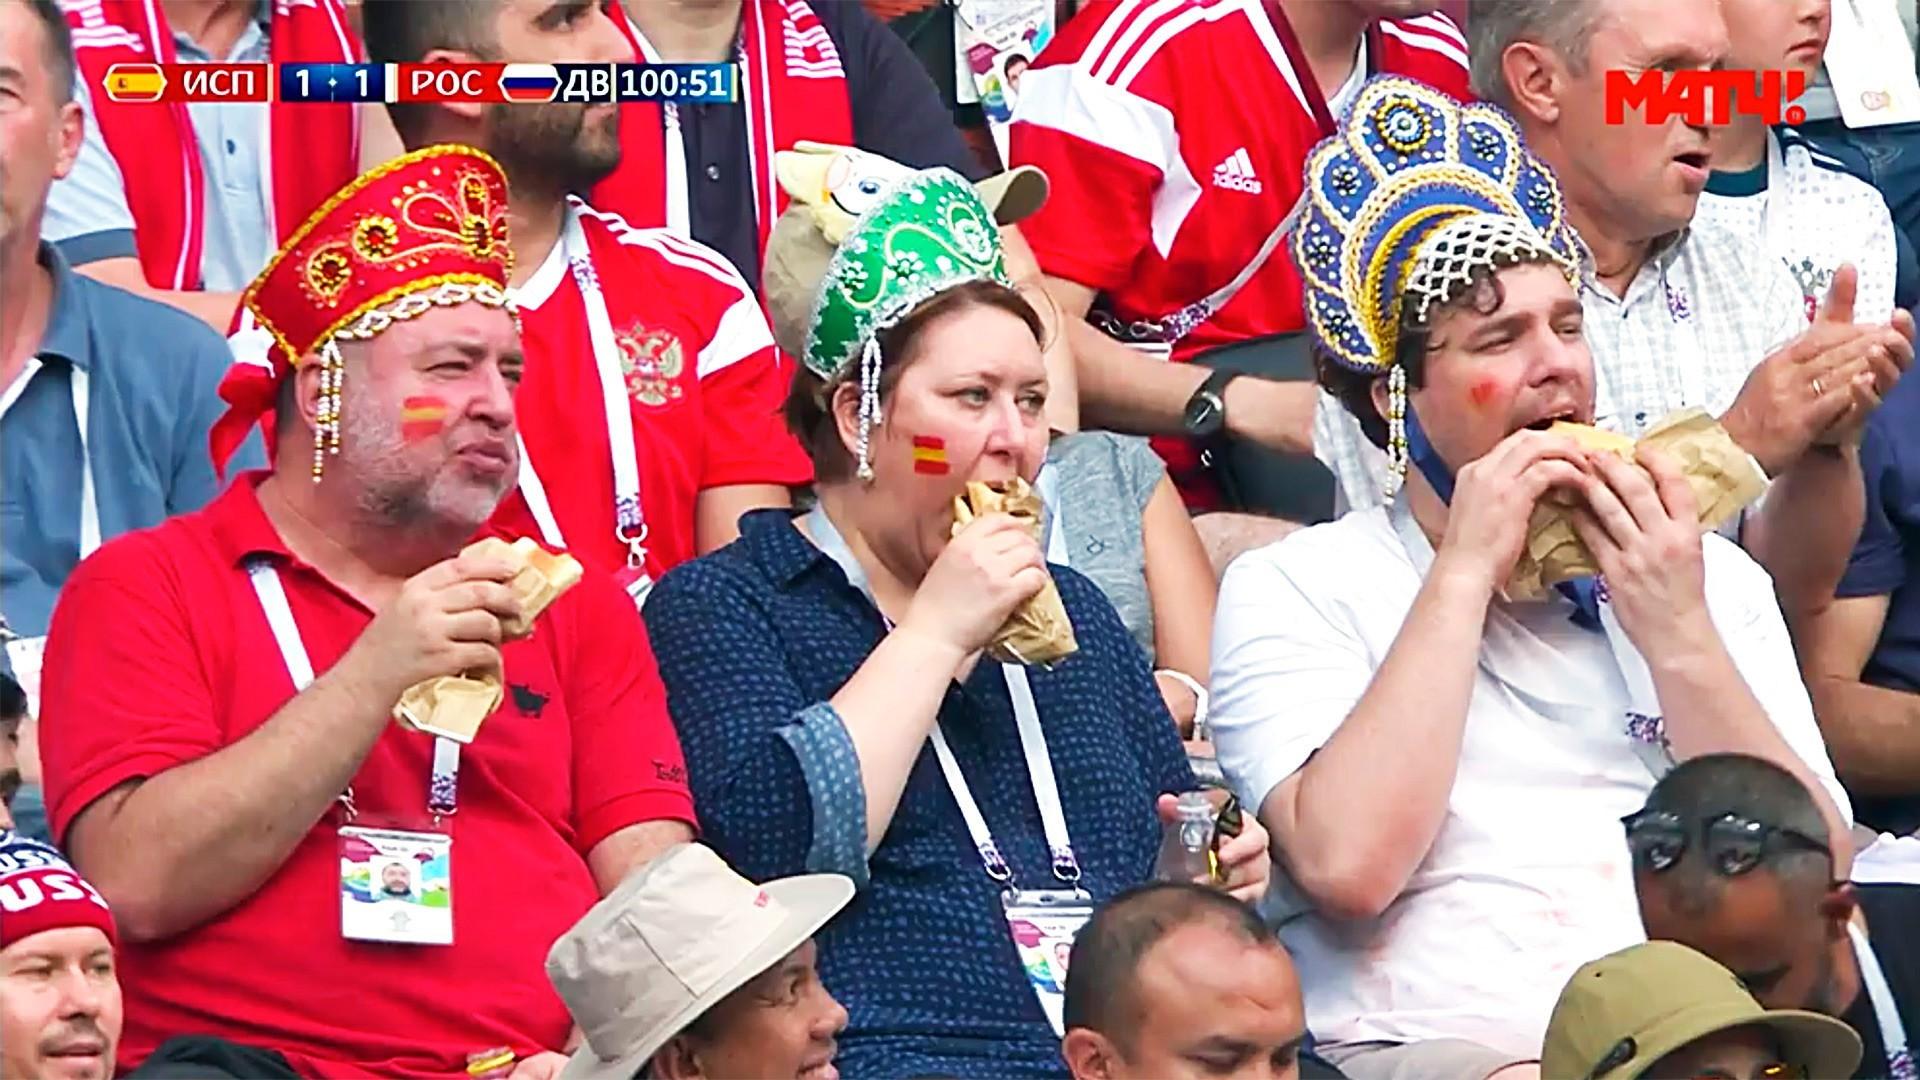 Ruski navijači s kokošniki, (nekakšnimi) ruskimi narodnimi pokrivali.